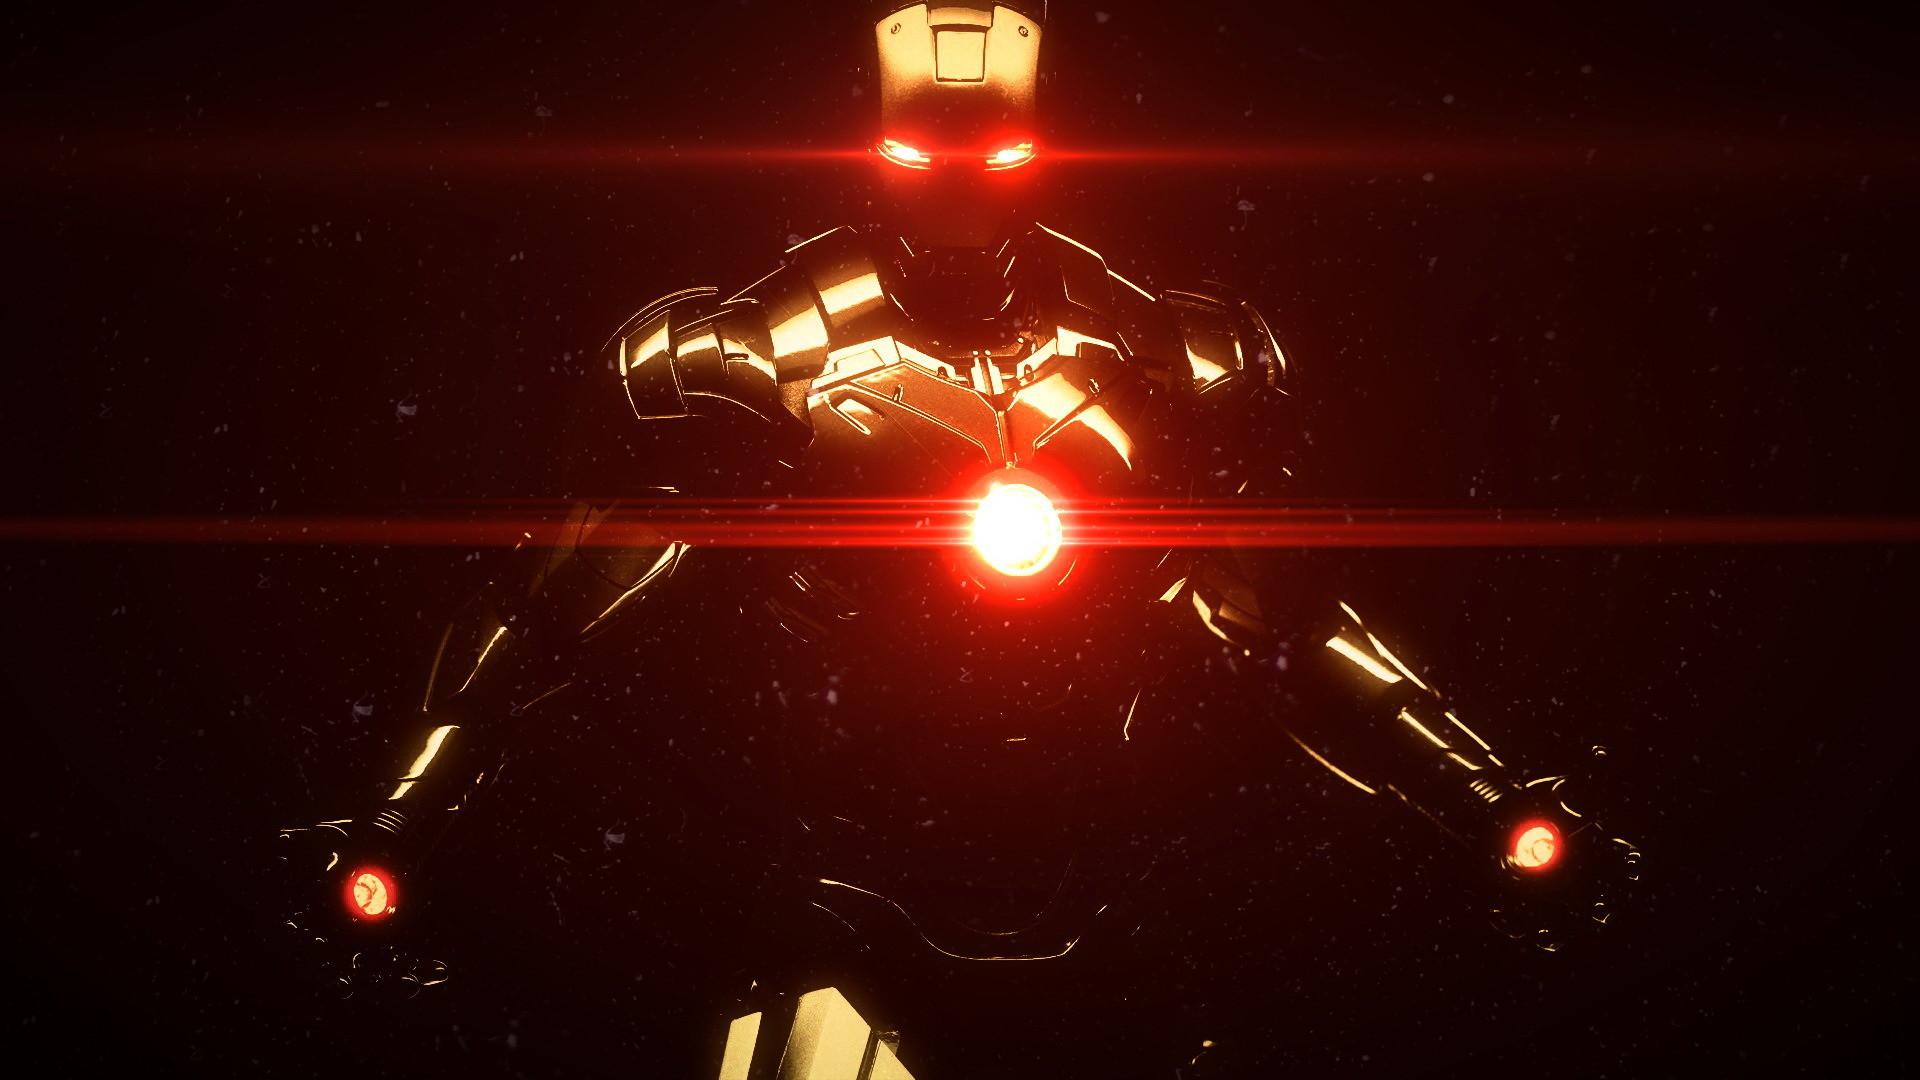 Movie – Iron Man Wallpaper